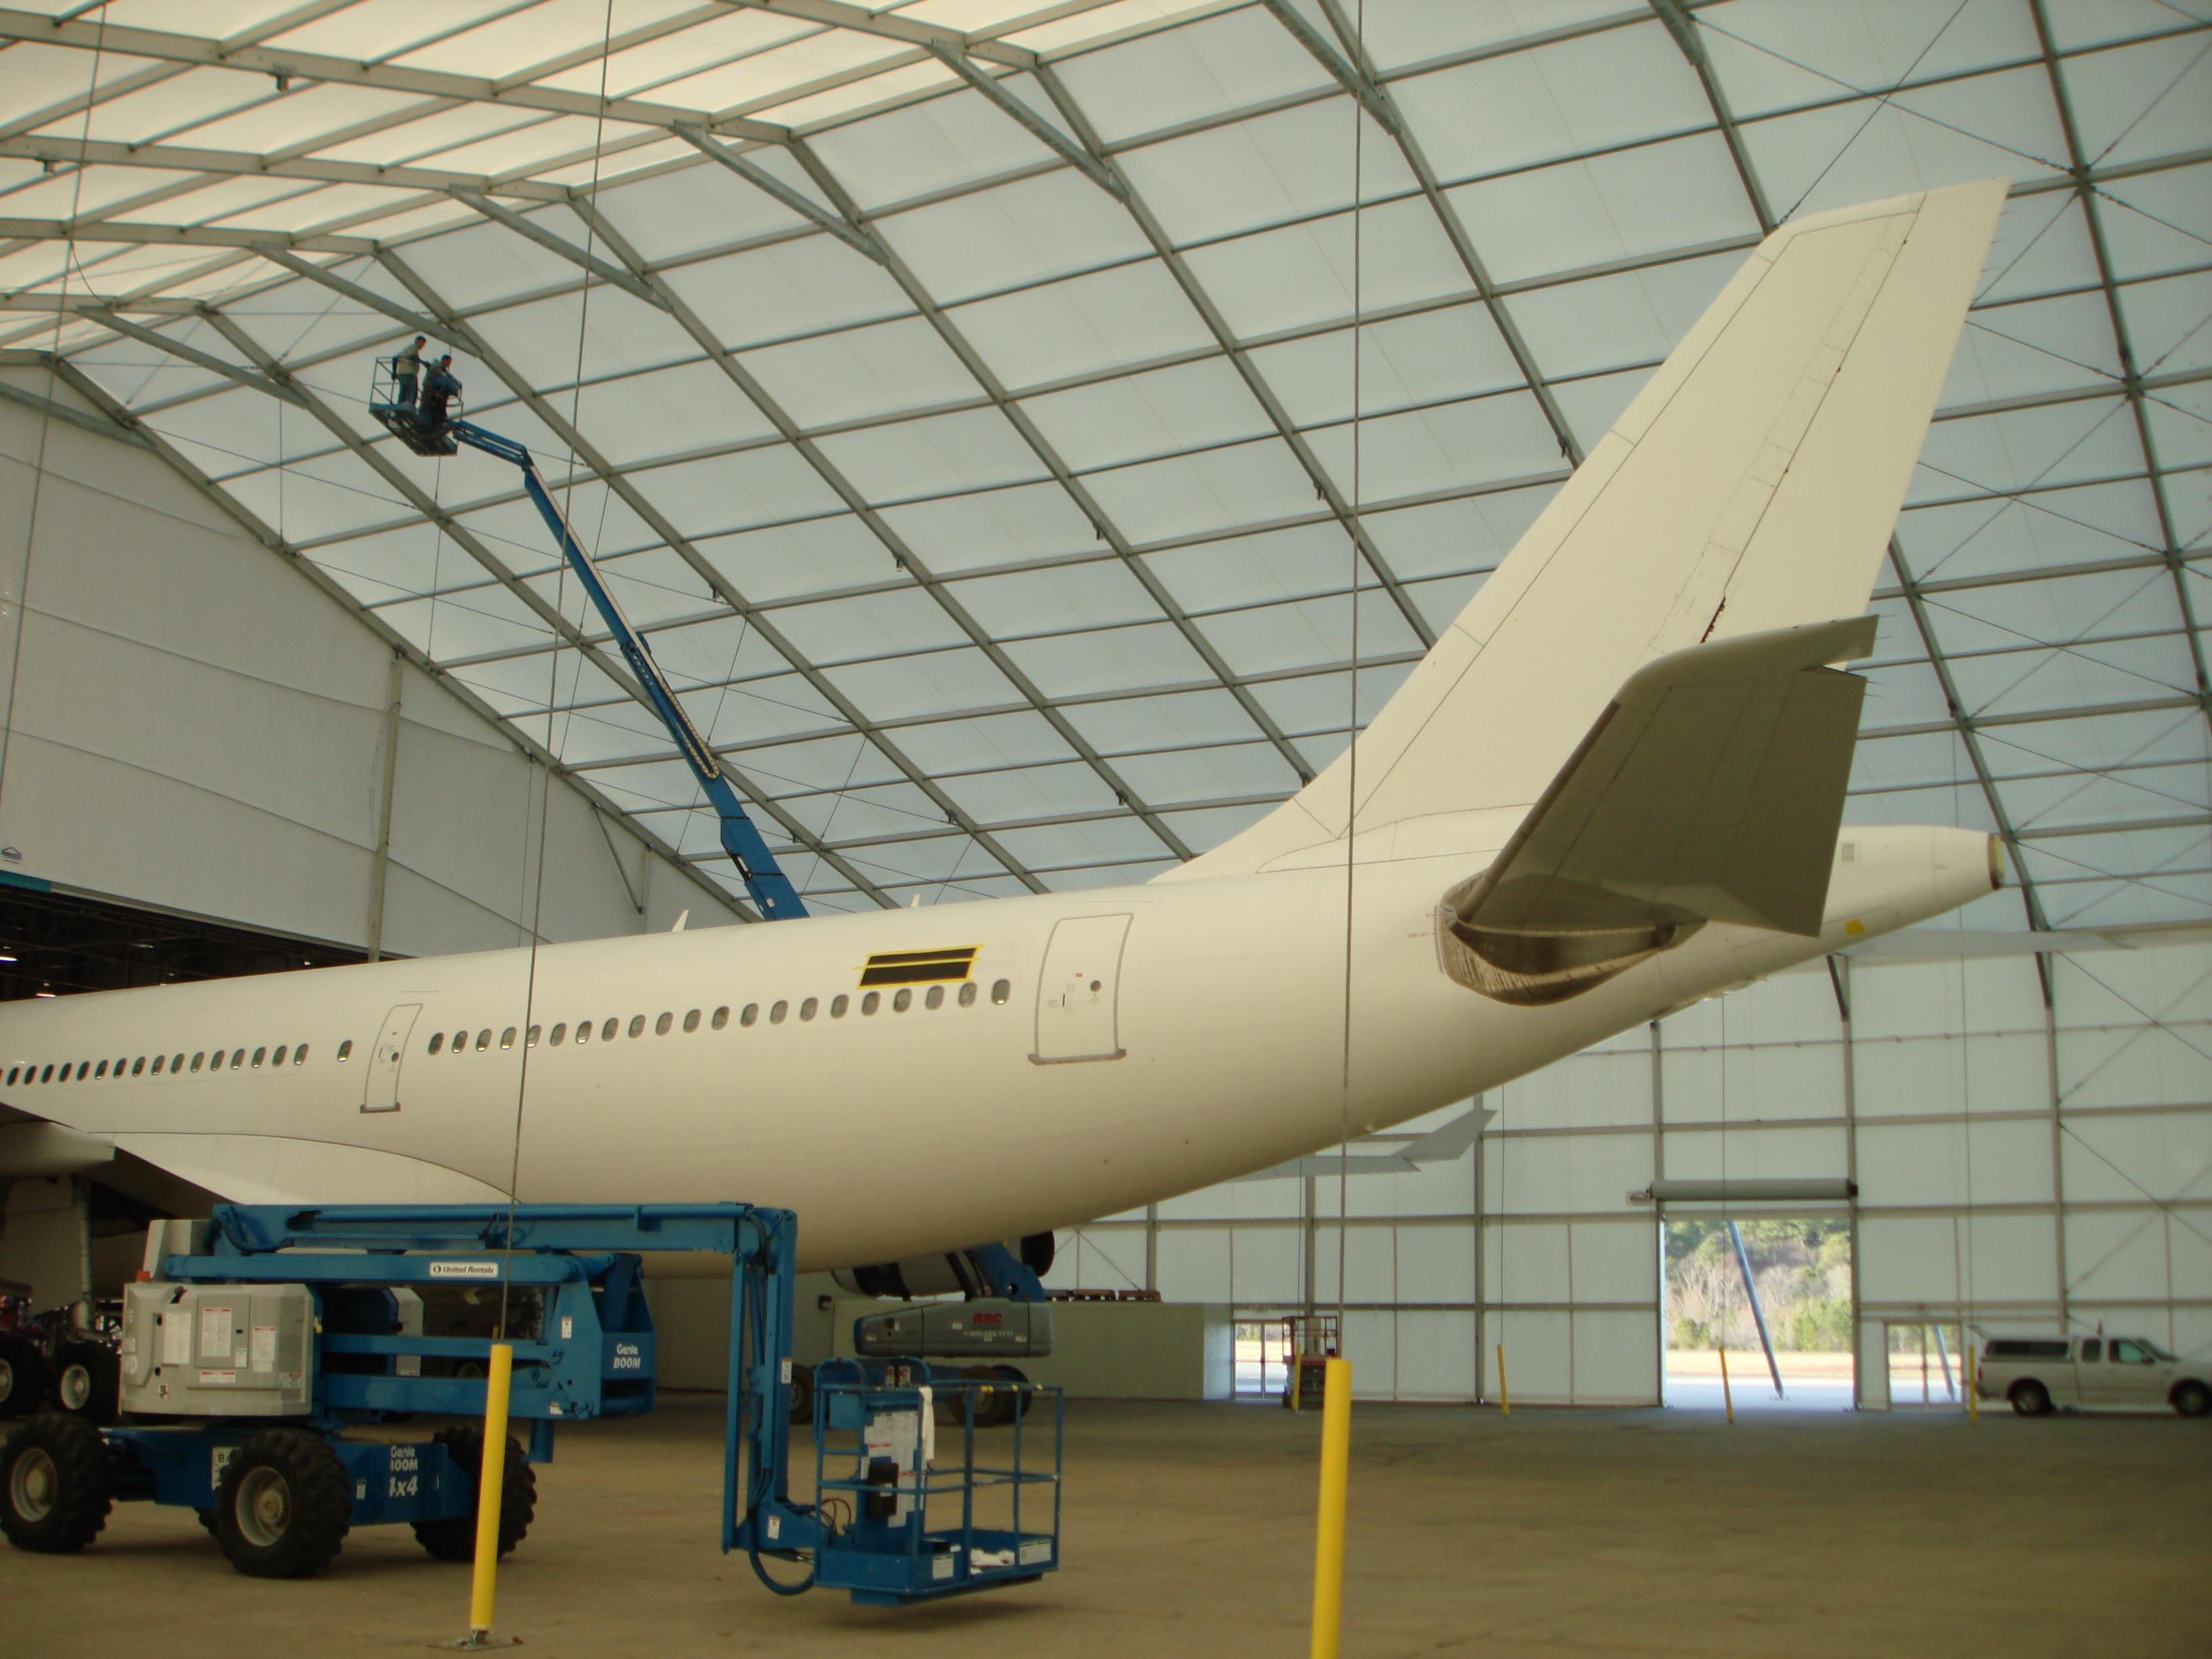 BaySys-025-Megastructure™-Interior-Jet-Rear